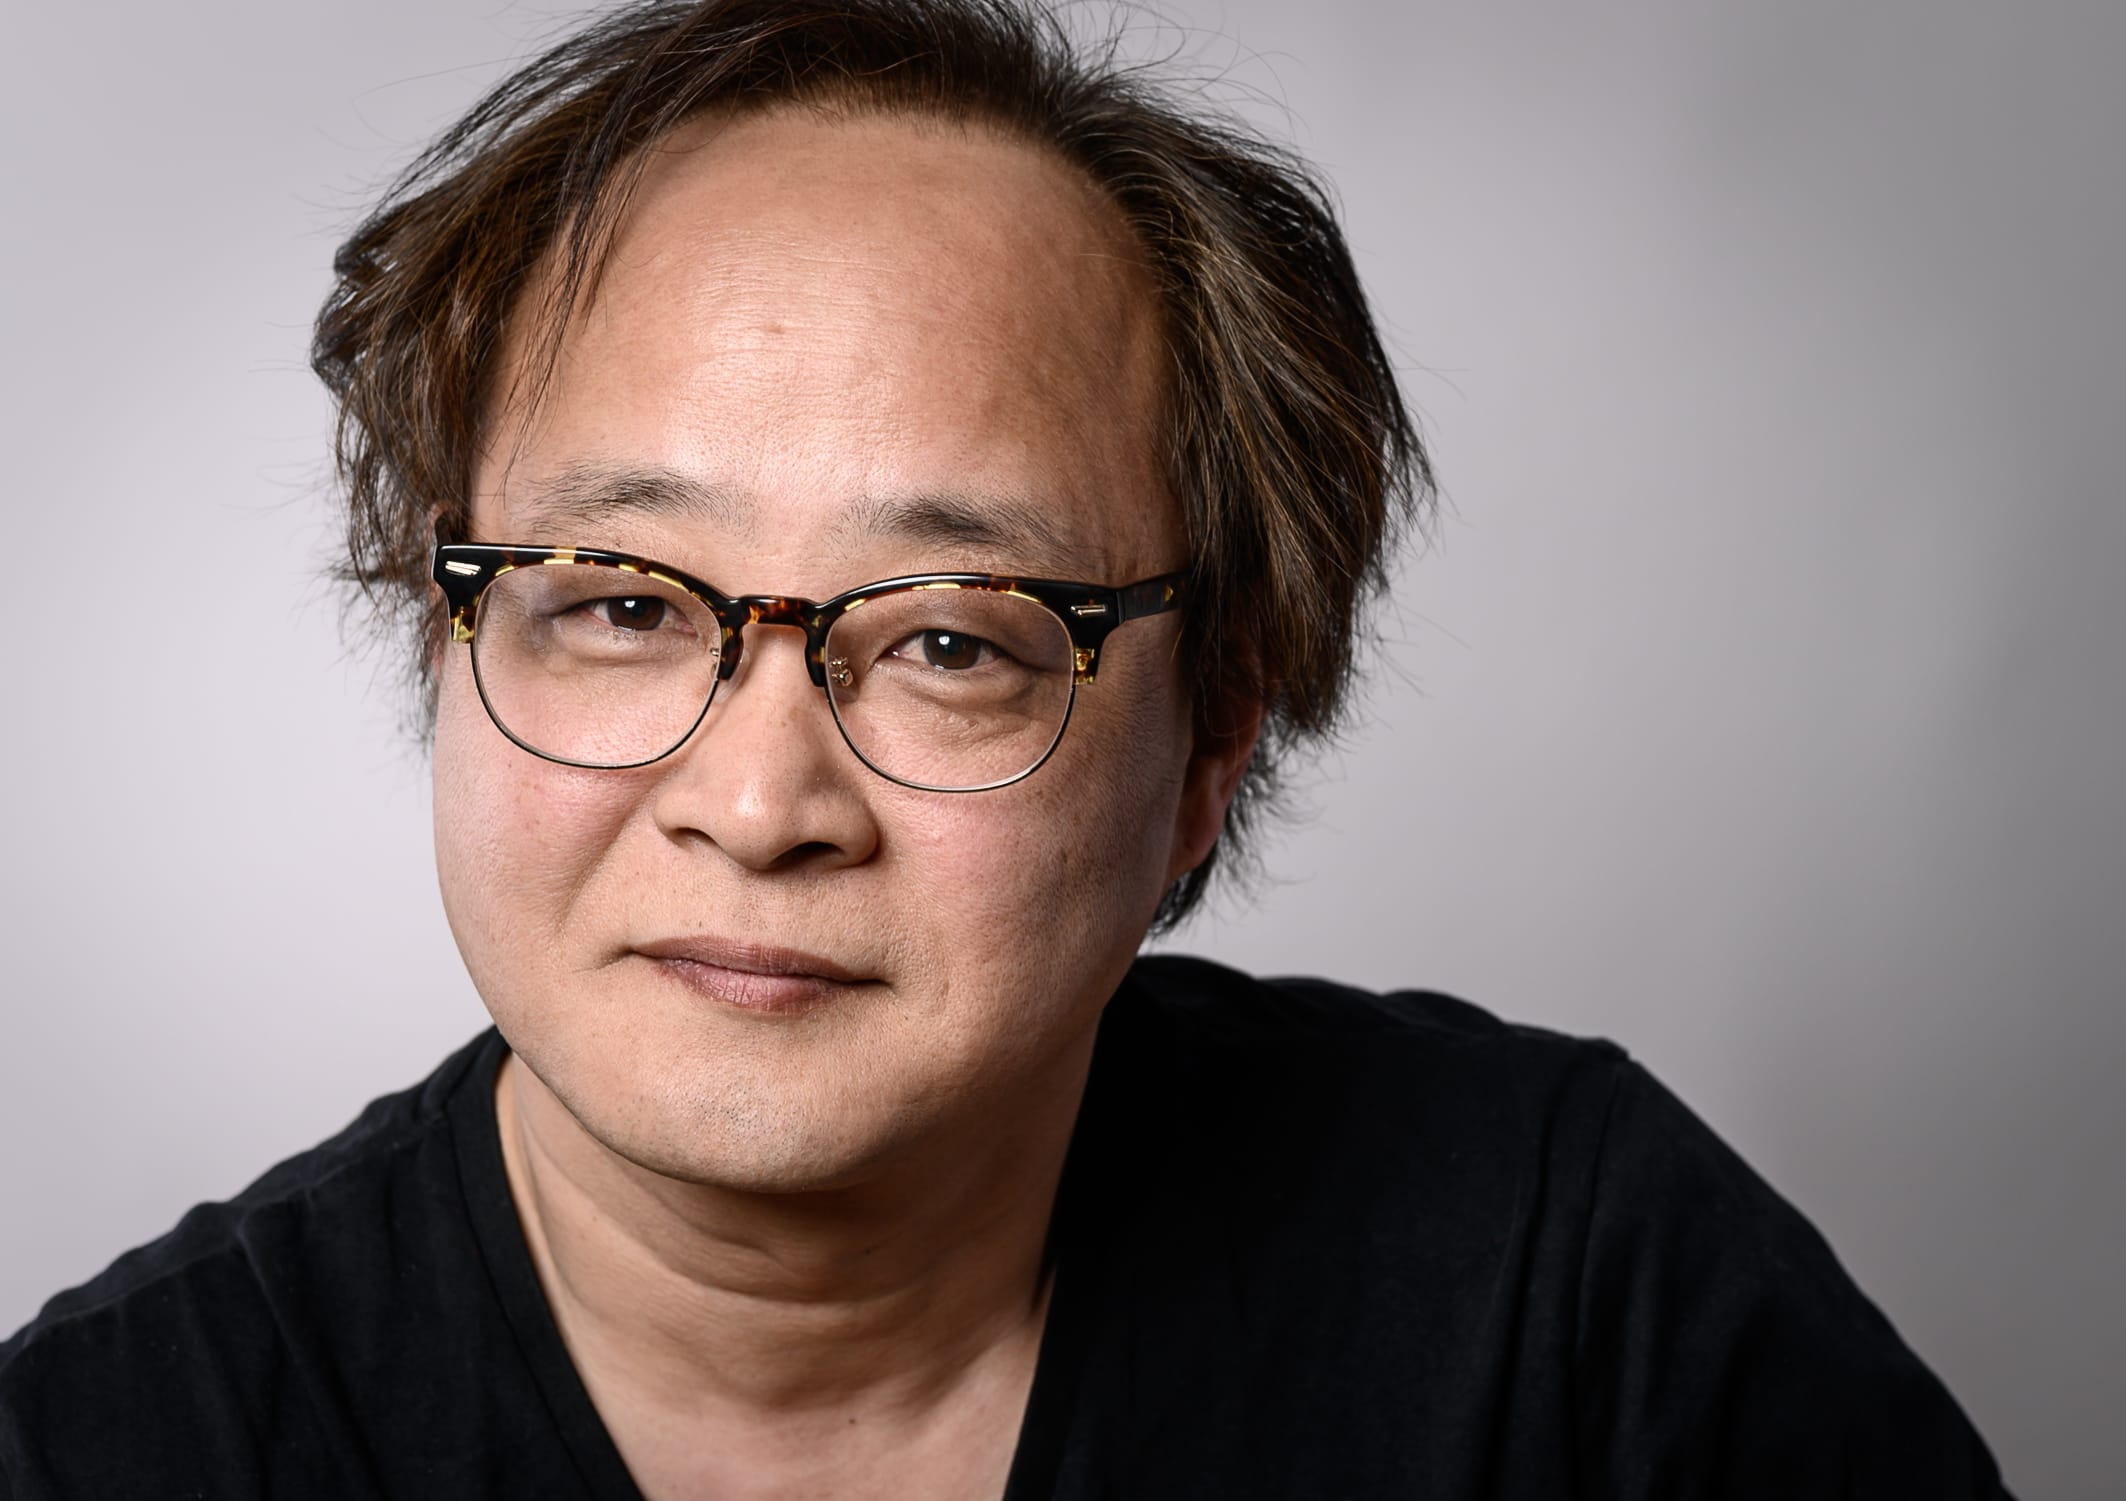 portrait Foto von Hyoung-Jun Lim